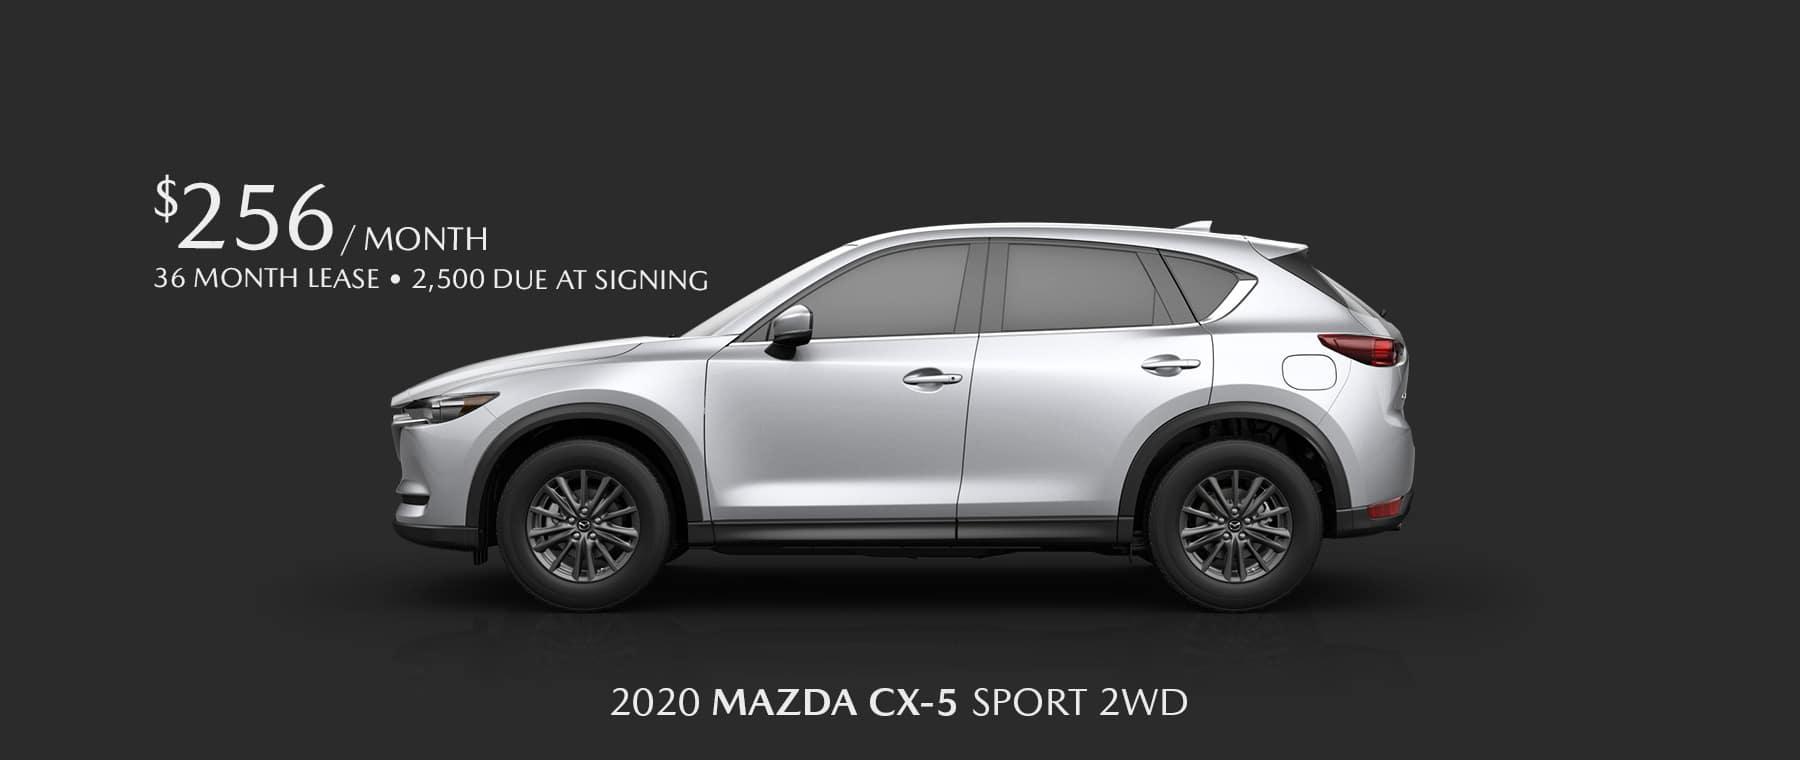 Mazda_CX5_256MO_1800x760